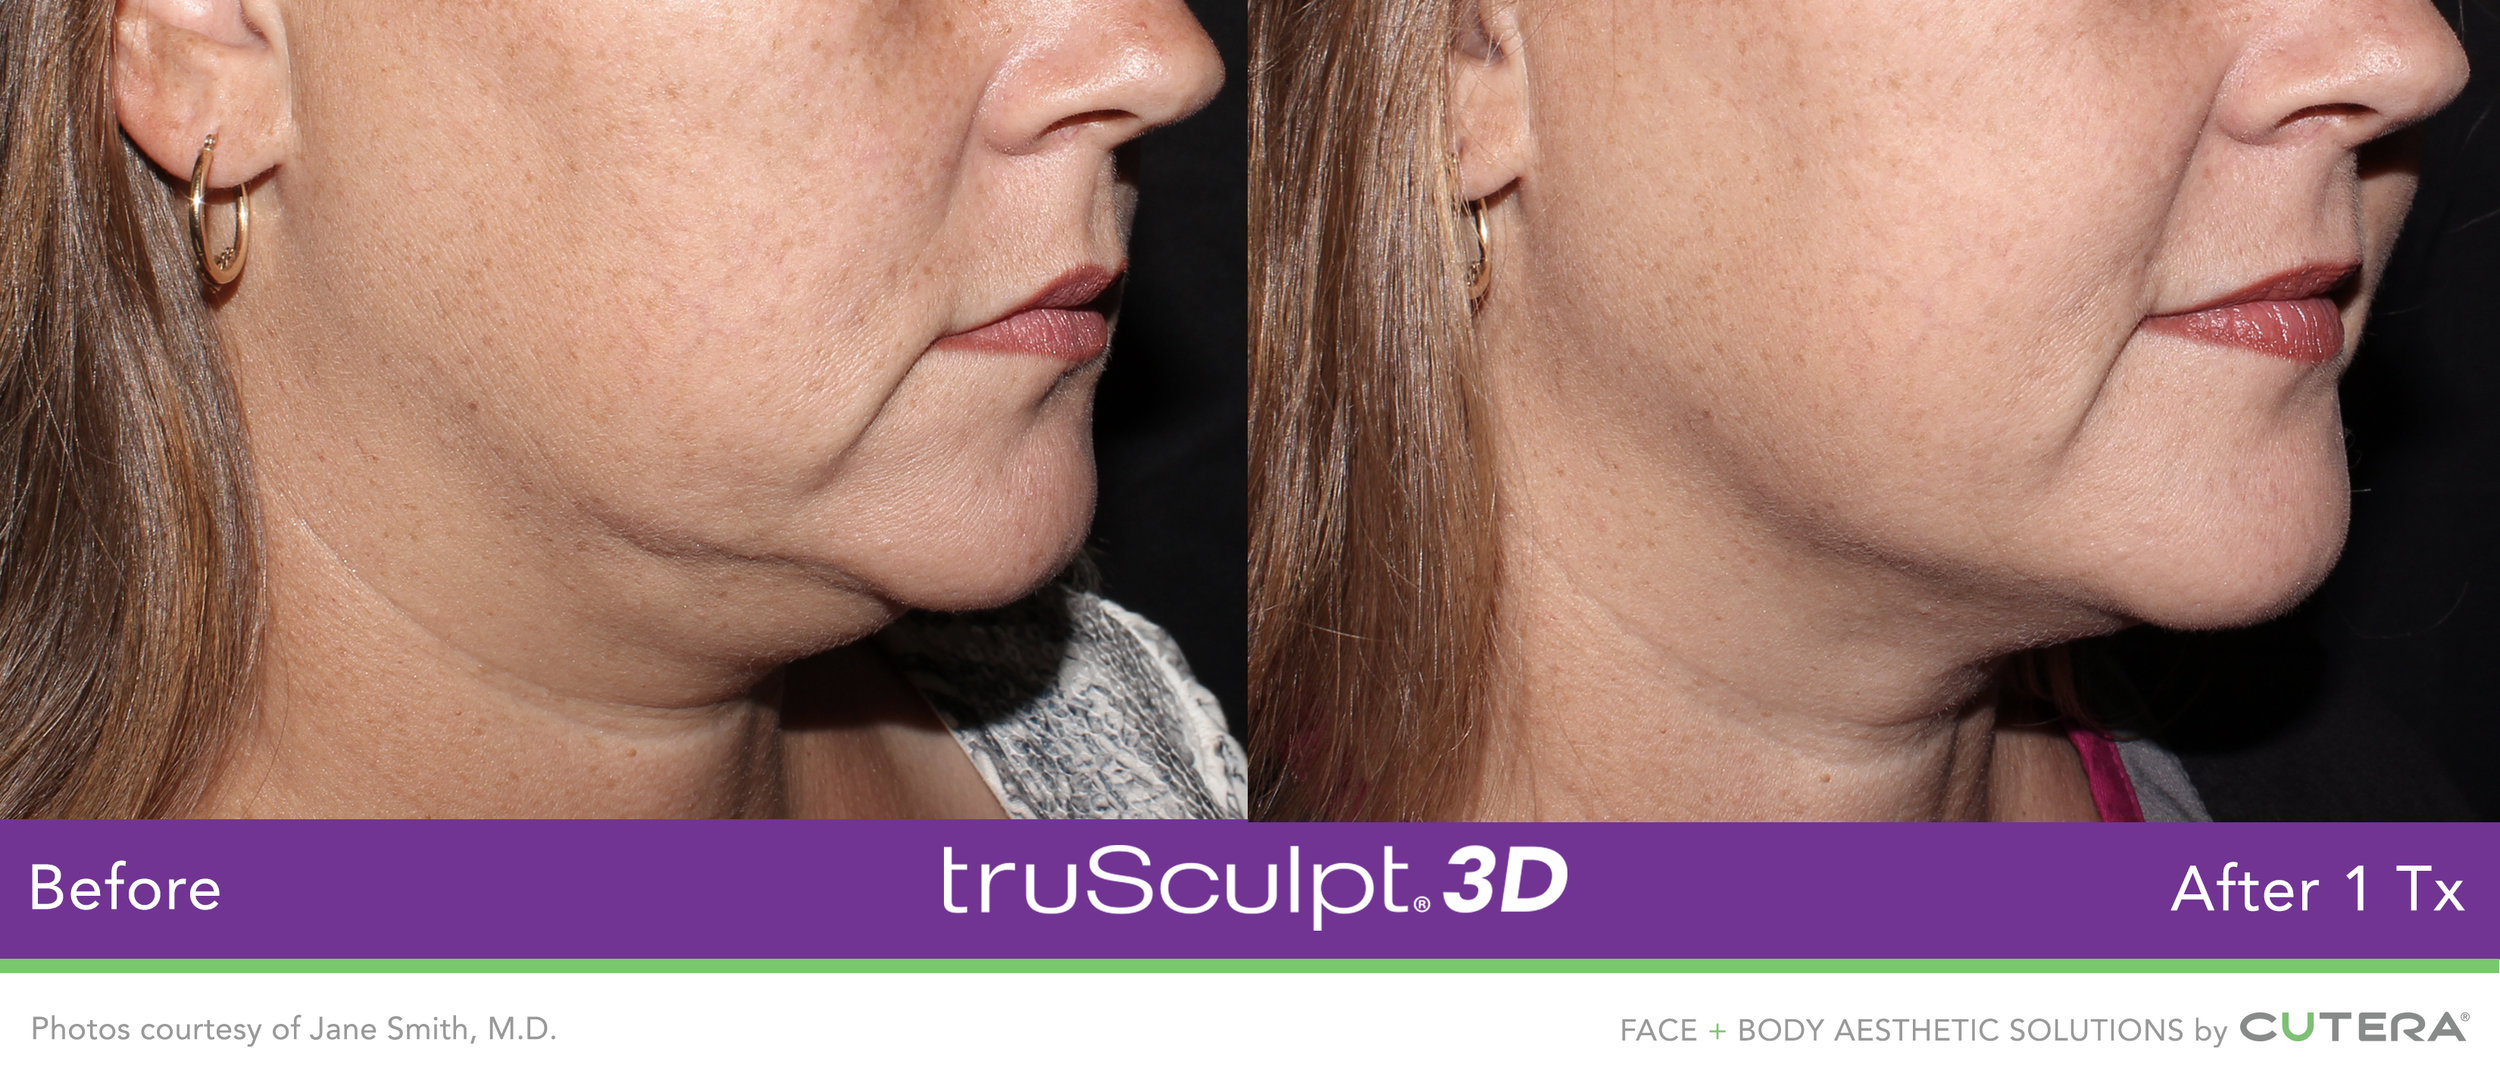 truSculpt-3D-B-A-Image-17.jpg